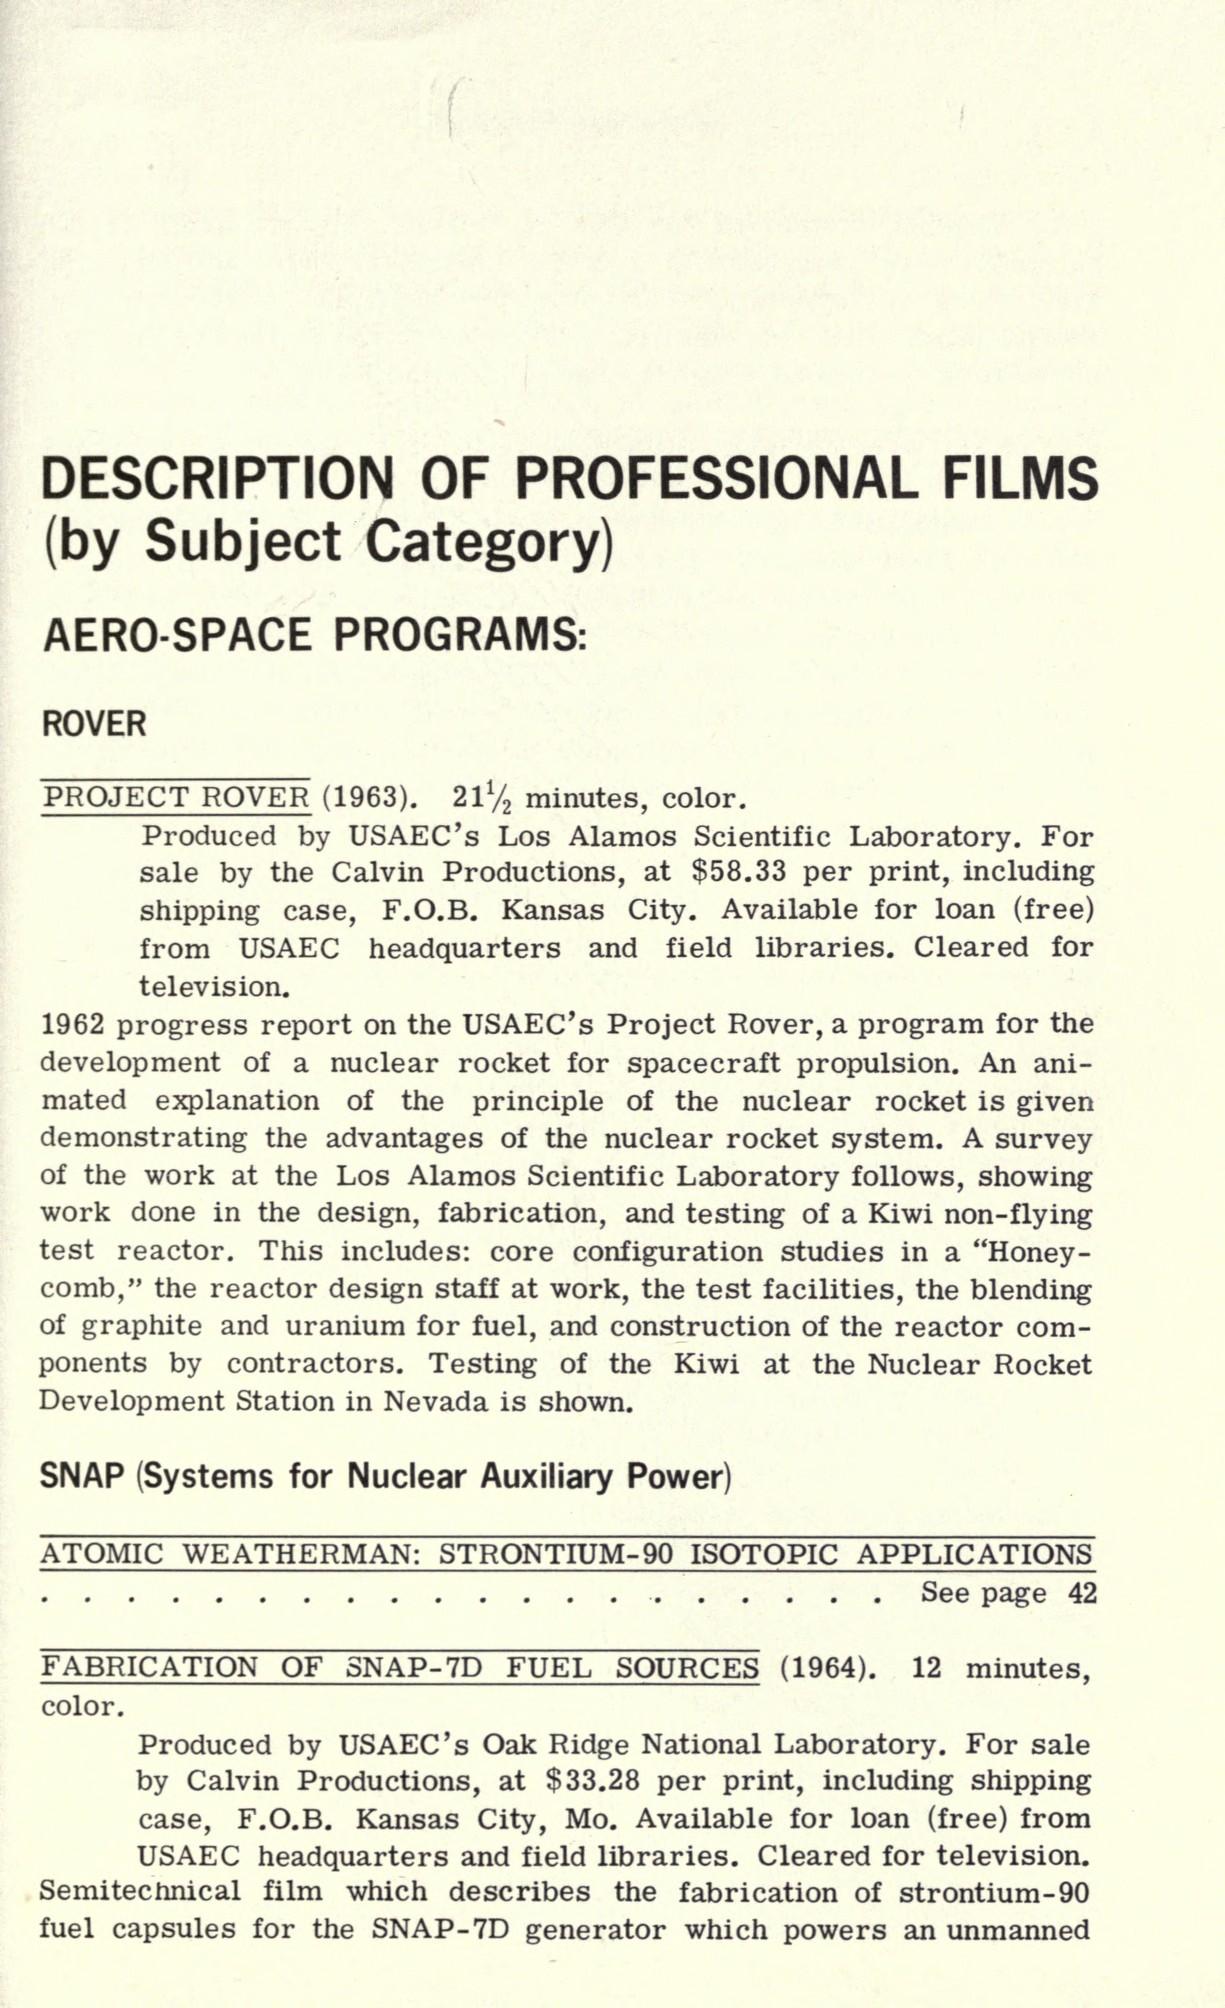 Combined16mmfilm00usatrich_jp2.zip&file=combined16mmfilm00usatrich_jp2%2fcombined16mmfilm00usatrich_0021